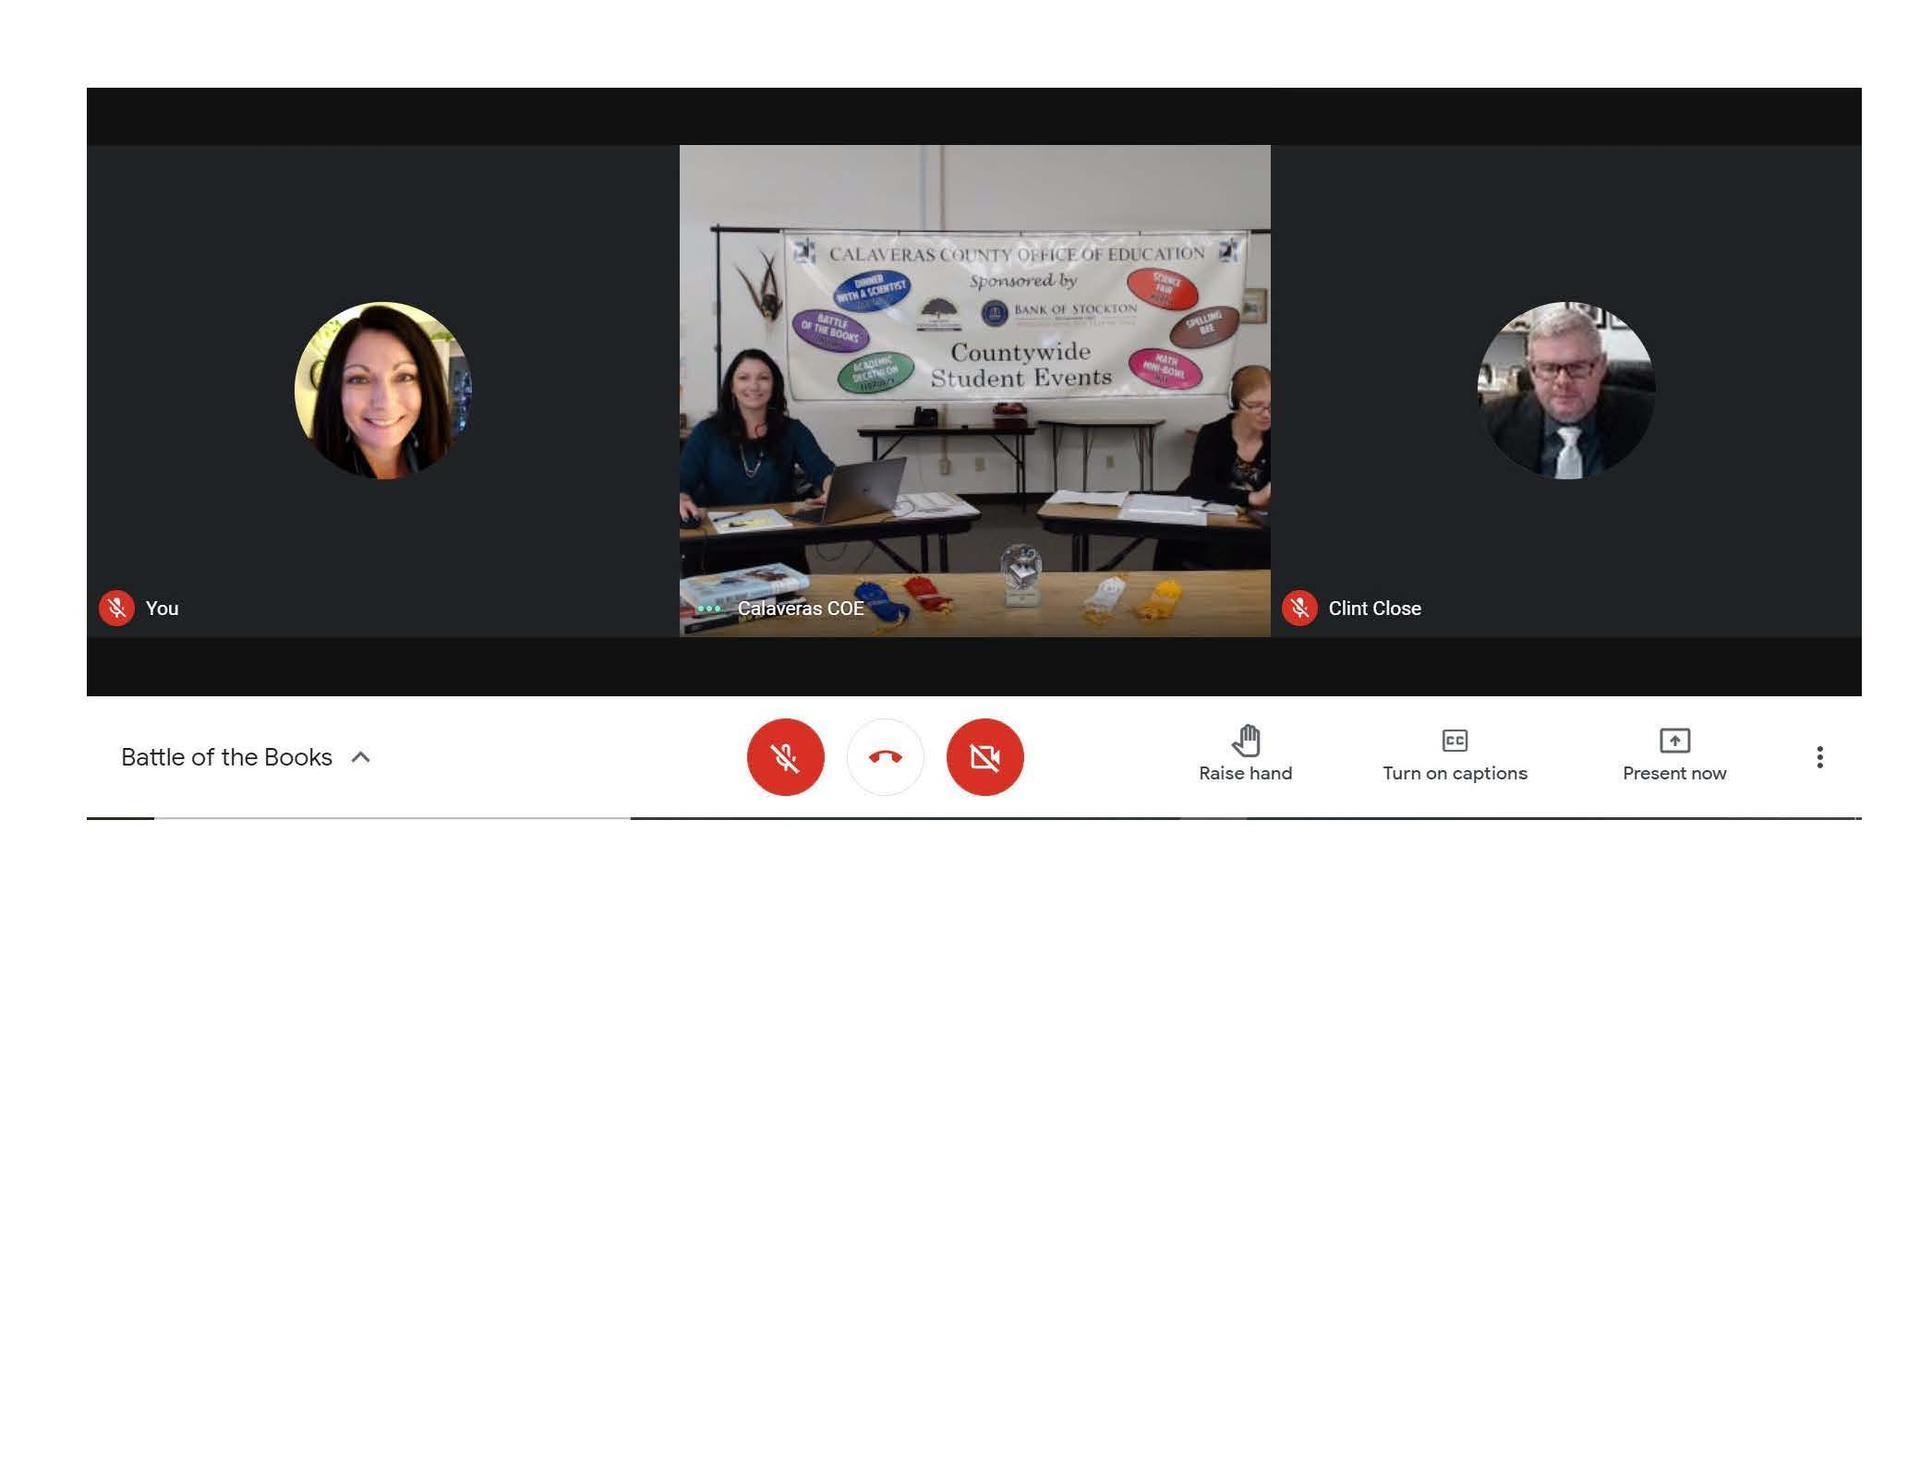 screen shot of virtual event